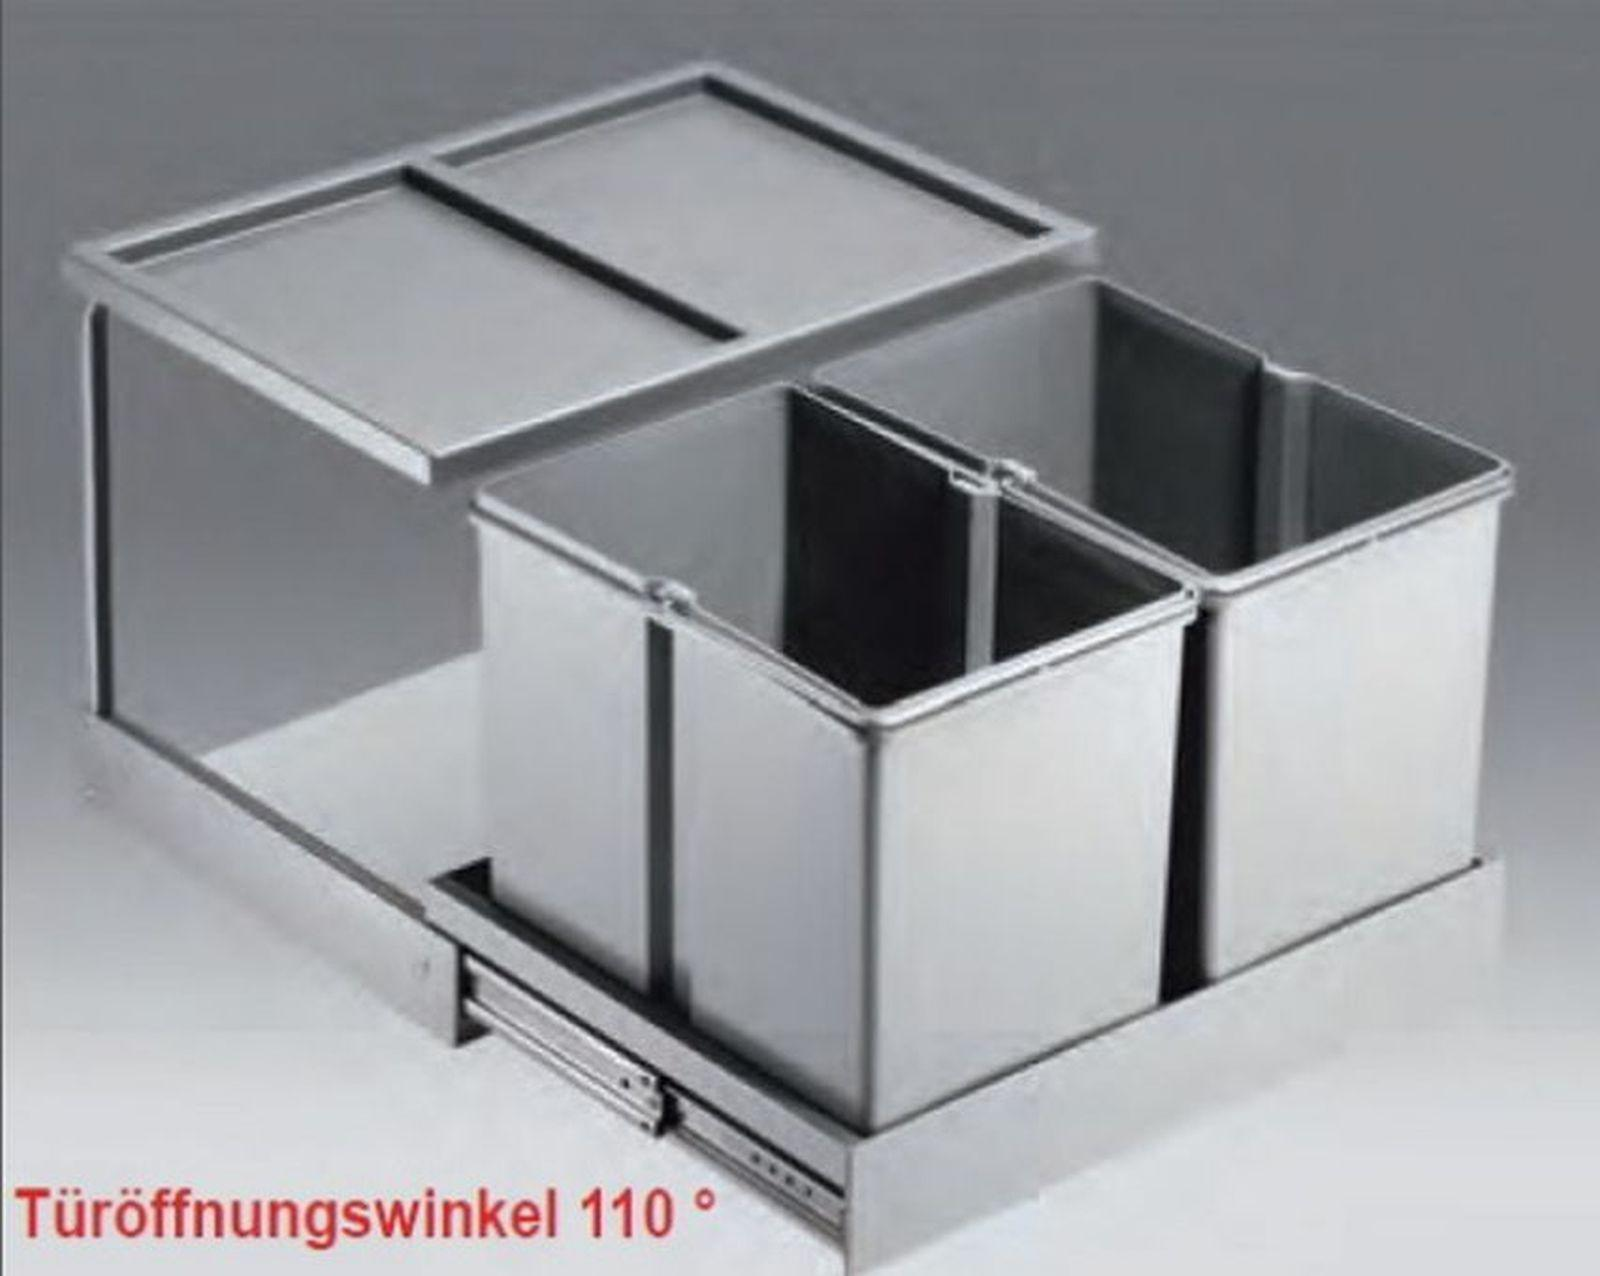 Ordentlich Wesco Double-Shorty 50 Automatik Mülleimer Küche 2x 15 Liter  PY35